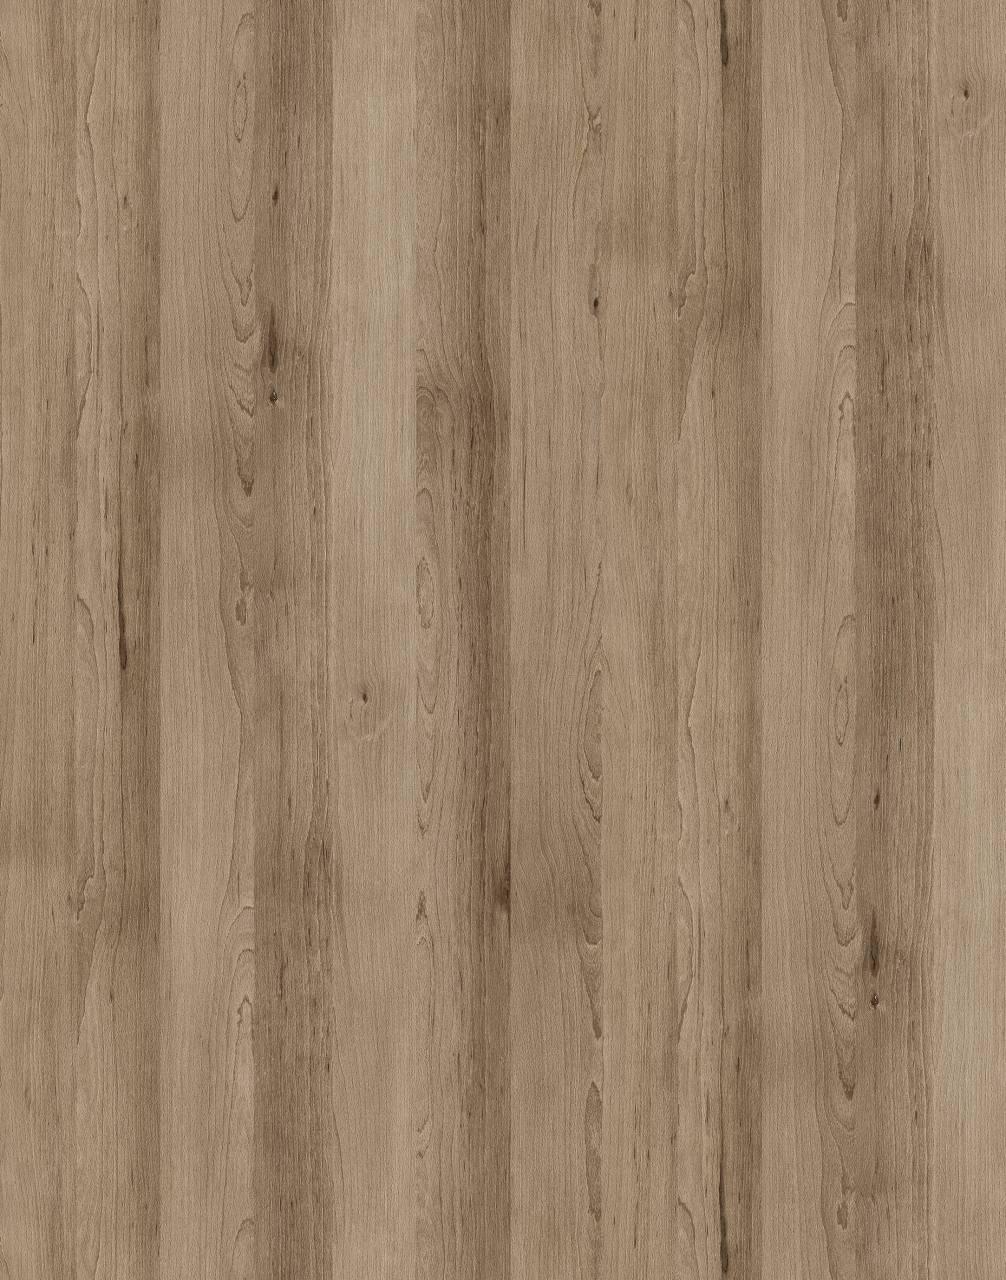 K014 Truffle Artisan Beech (MF PB sample)